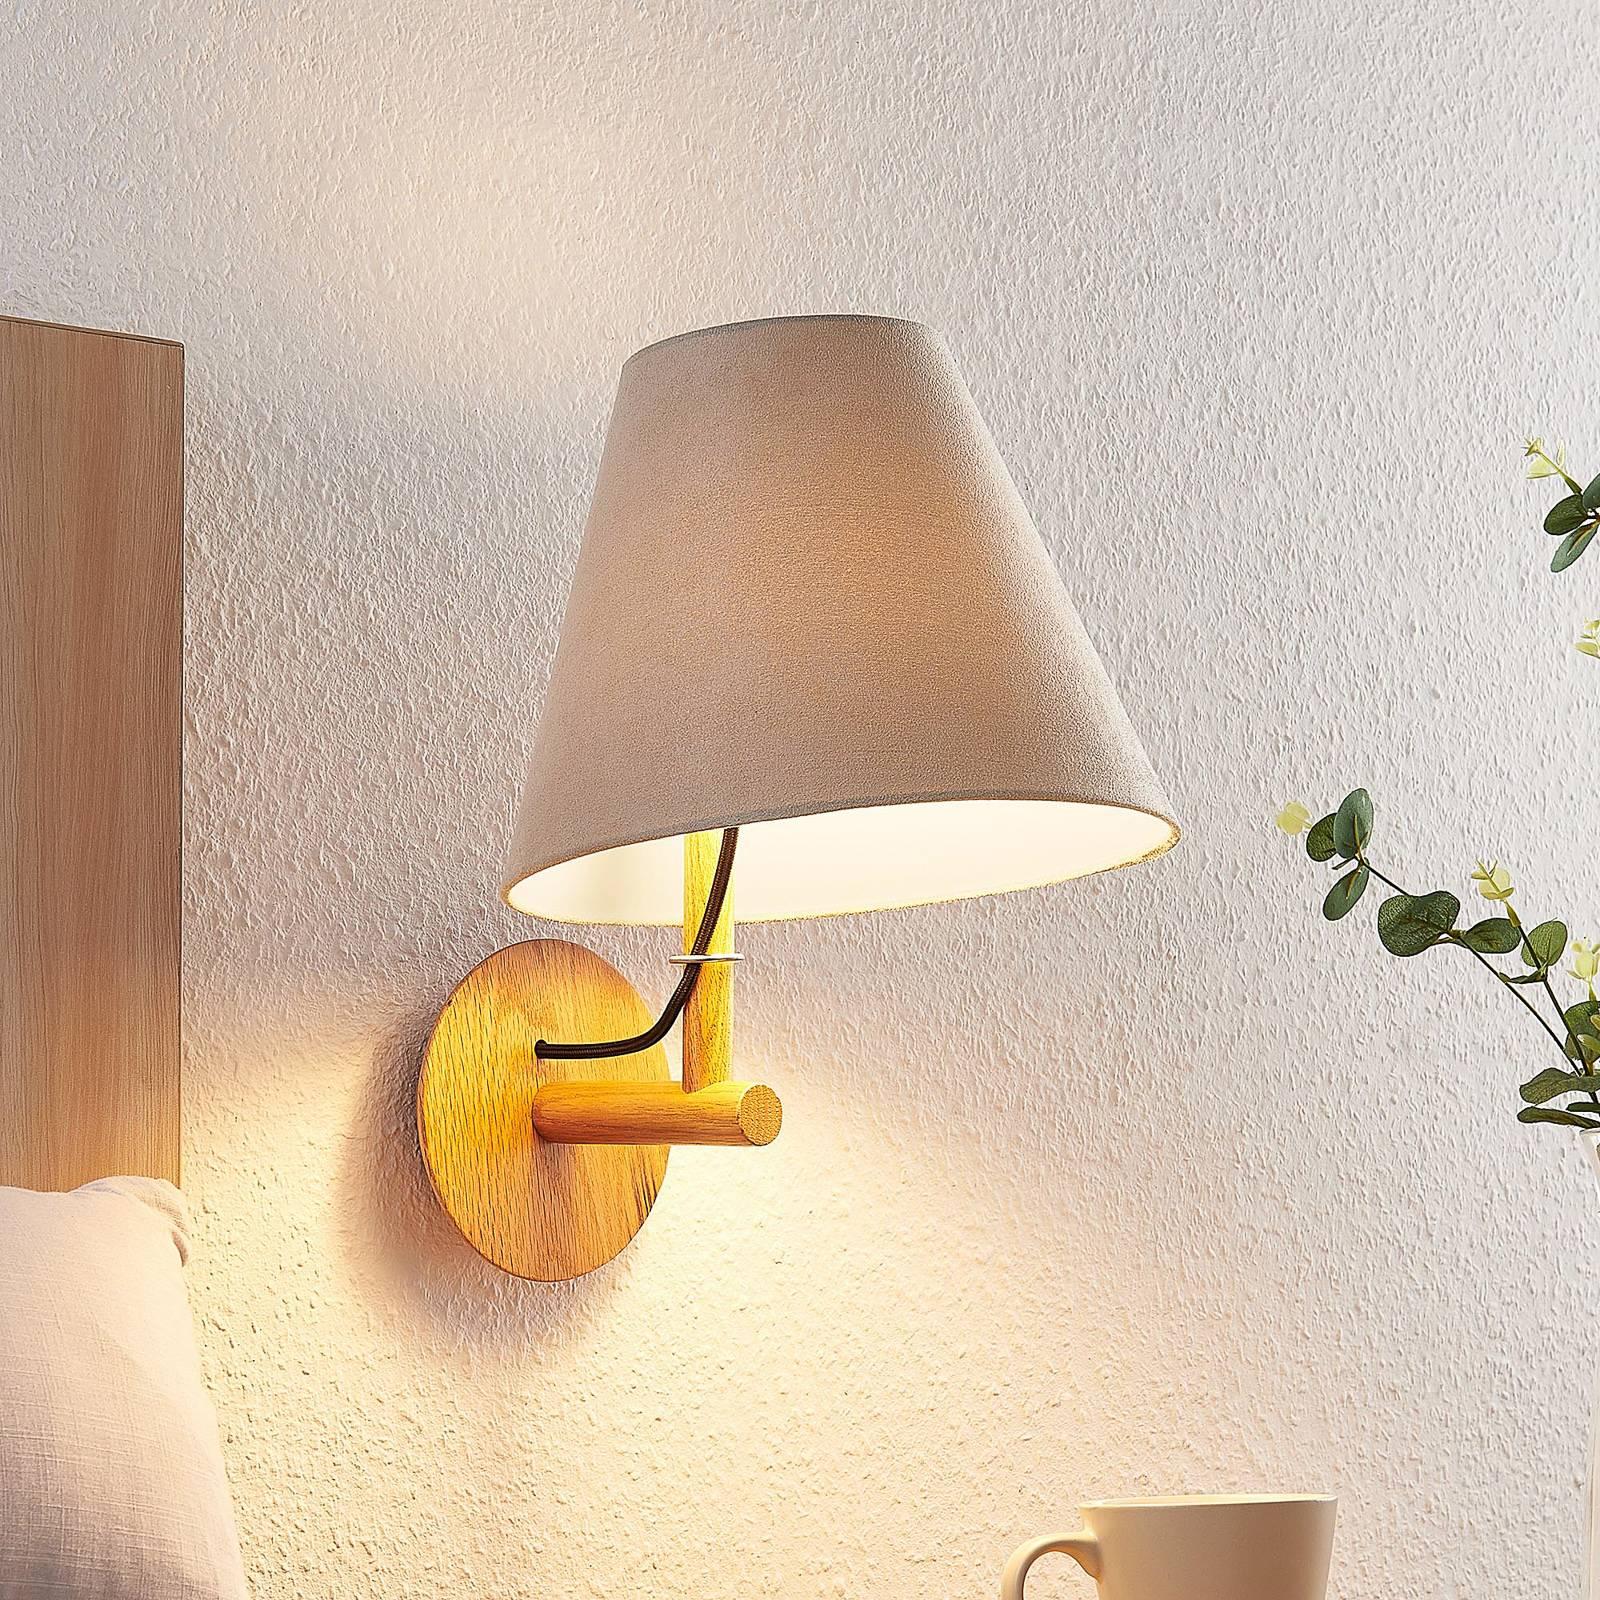 Lucande Jinda -seinälamppu, puurunko, sametti